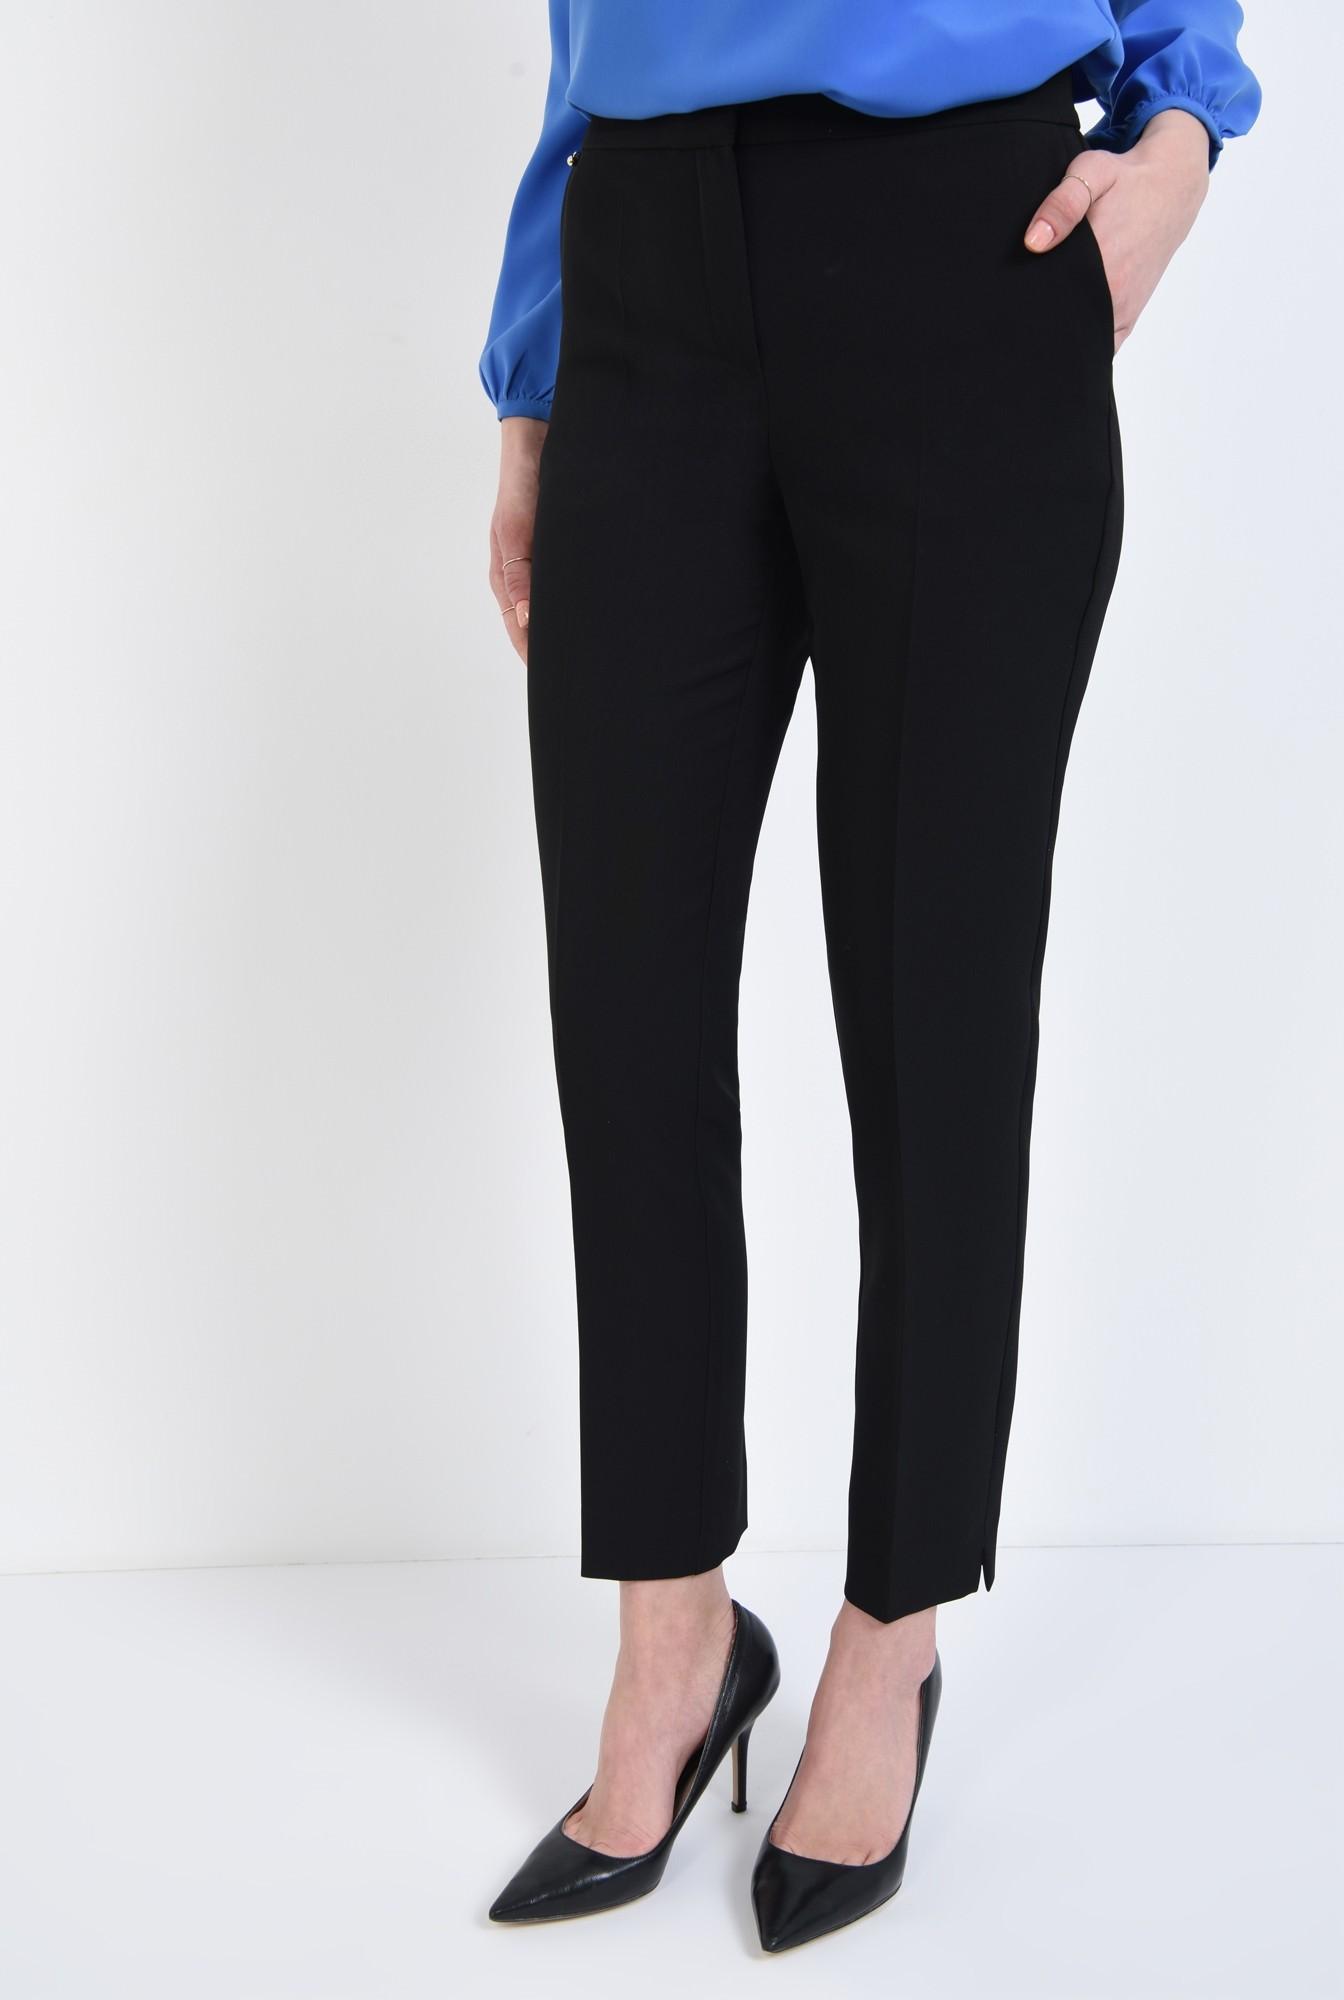 2 - Pantaloni casual, negru, cu buzunare laterale